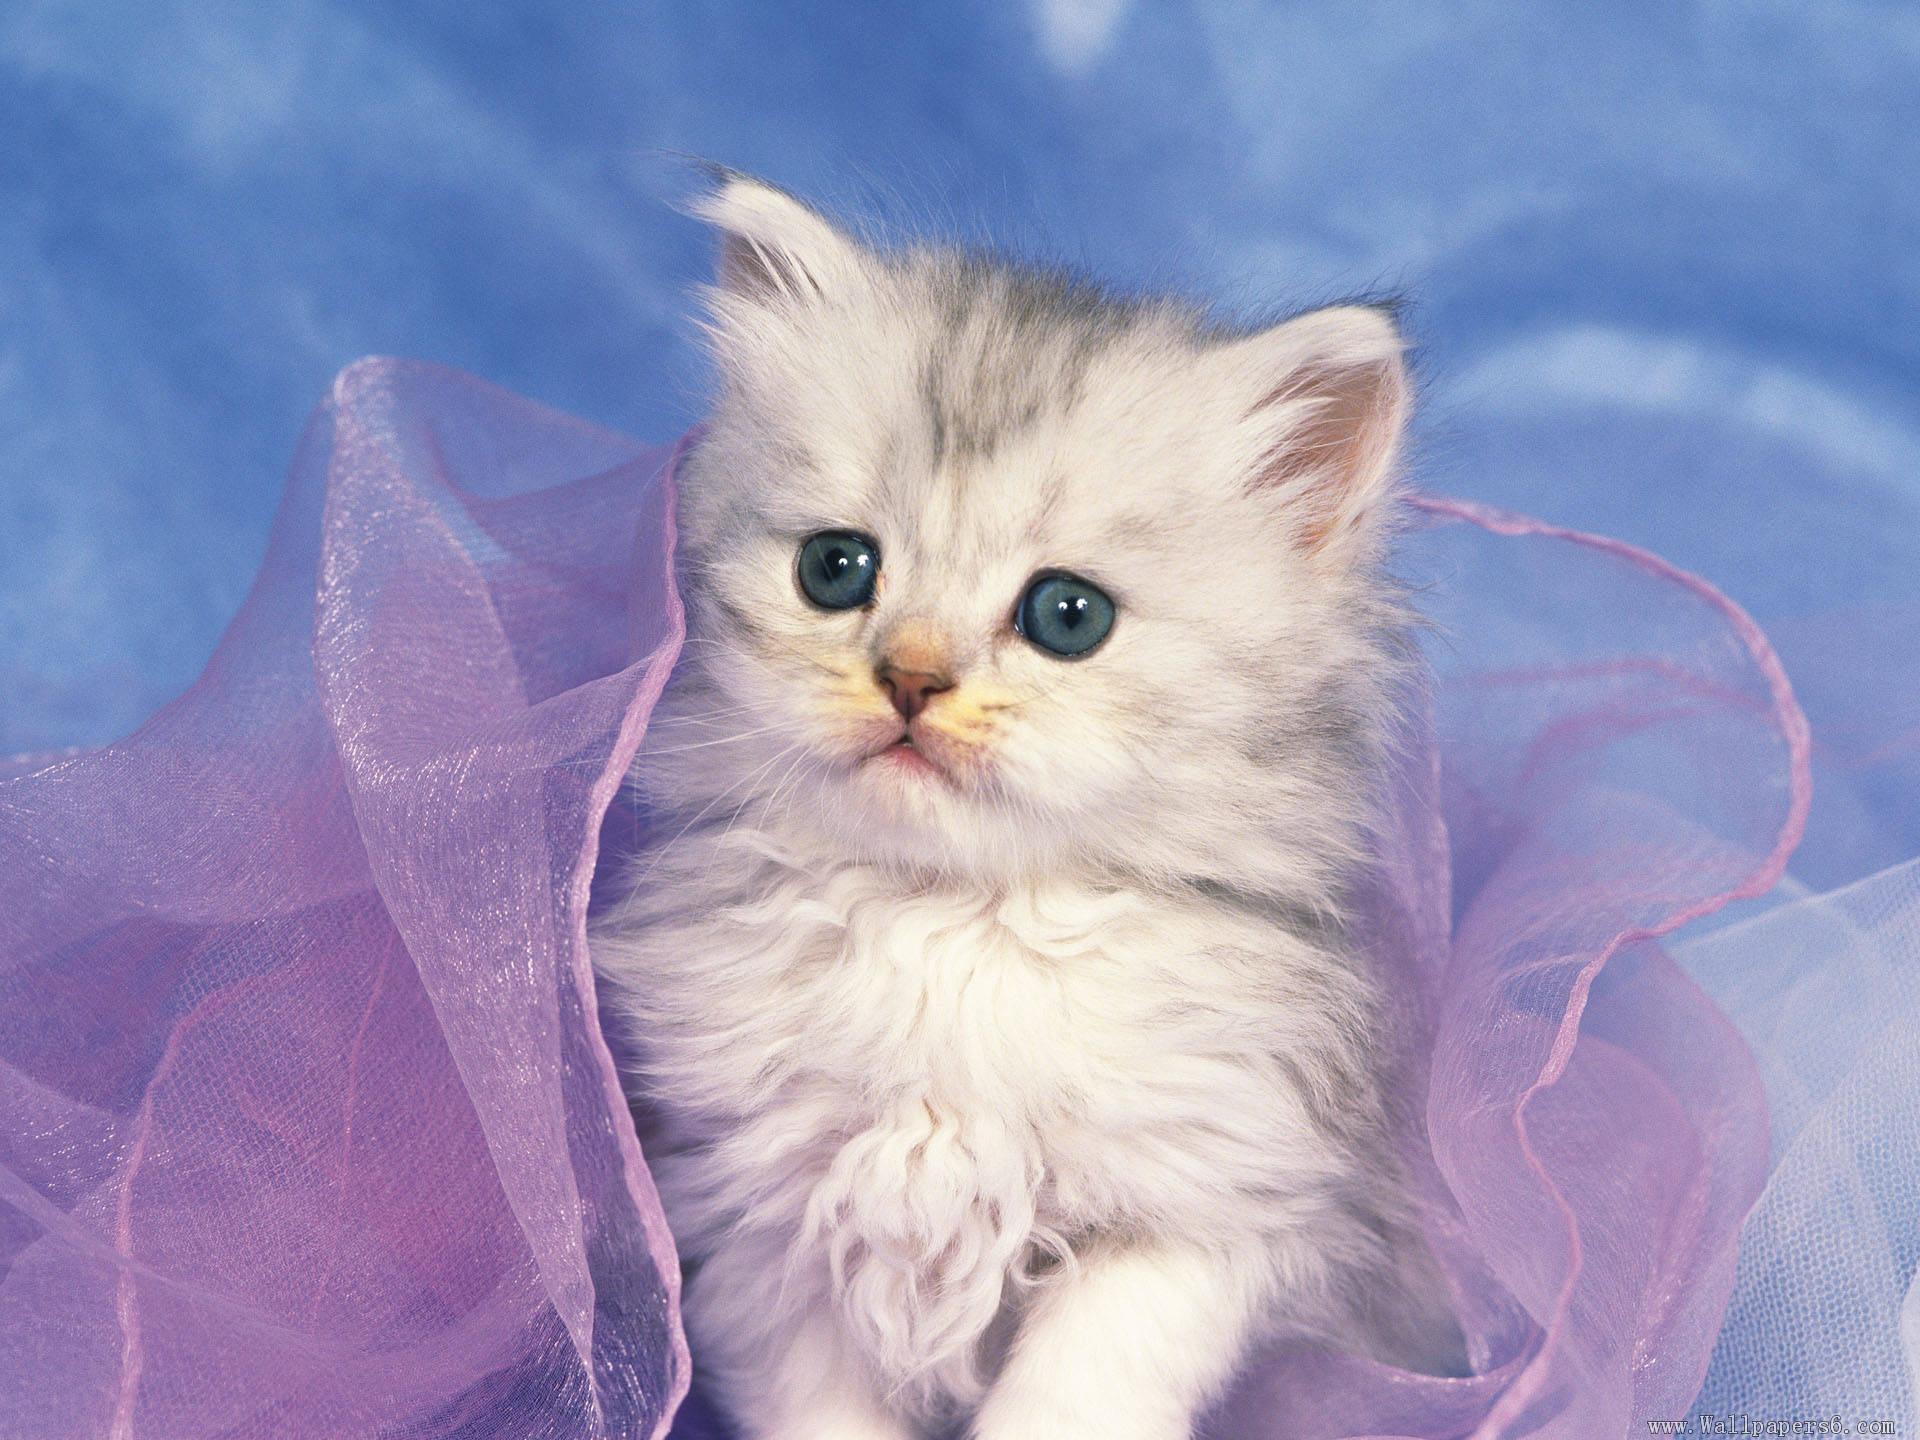 Res: 1920x1440, Cute White Kitten